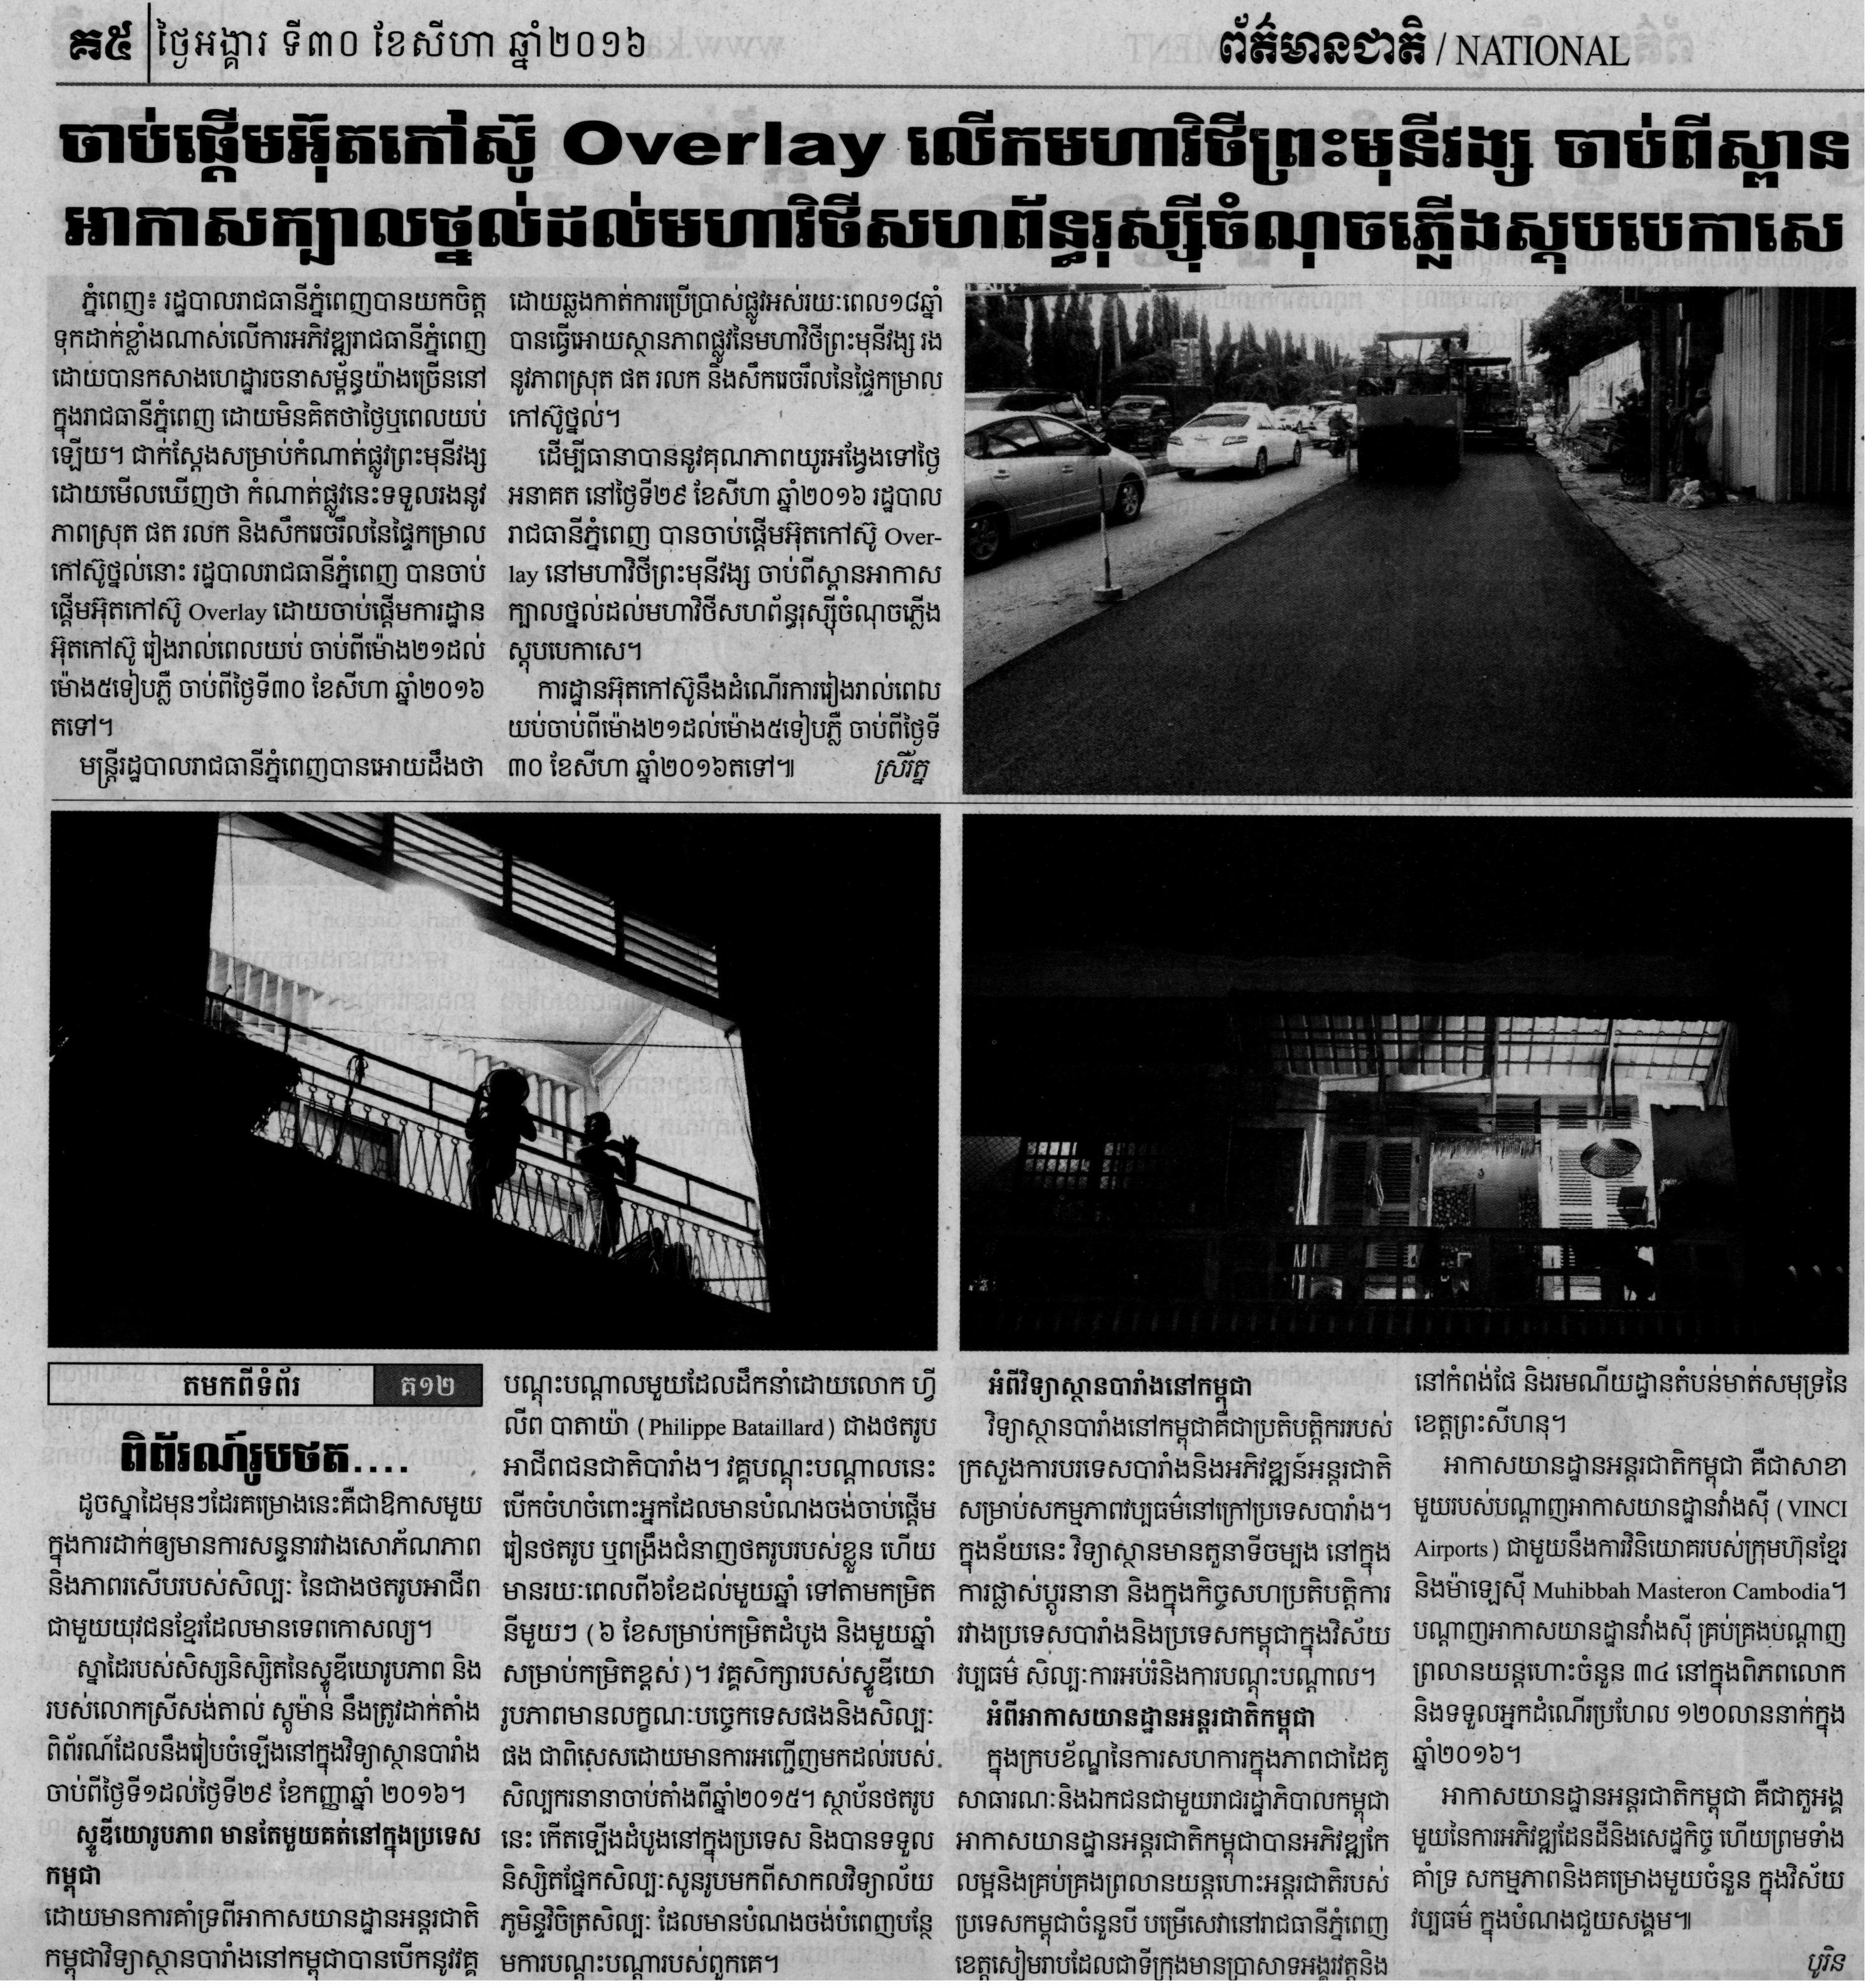 Article / Phnom Penh